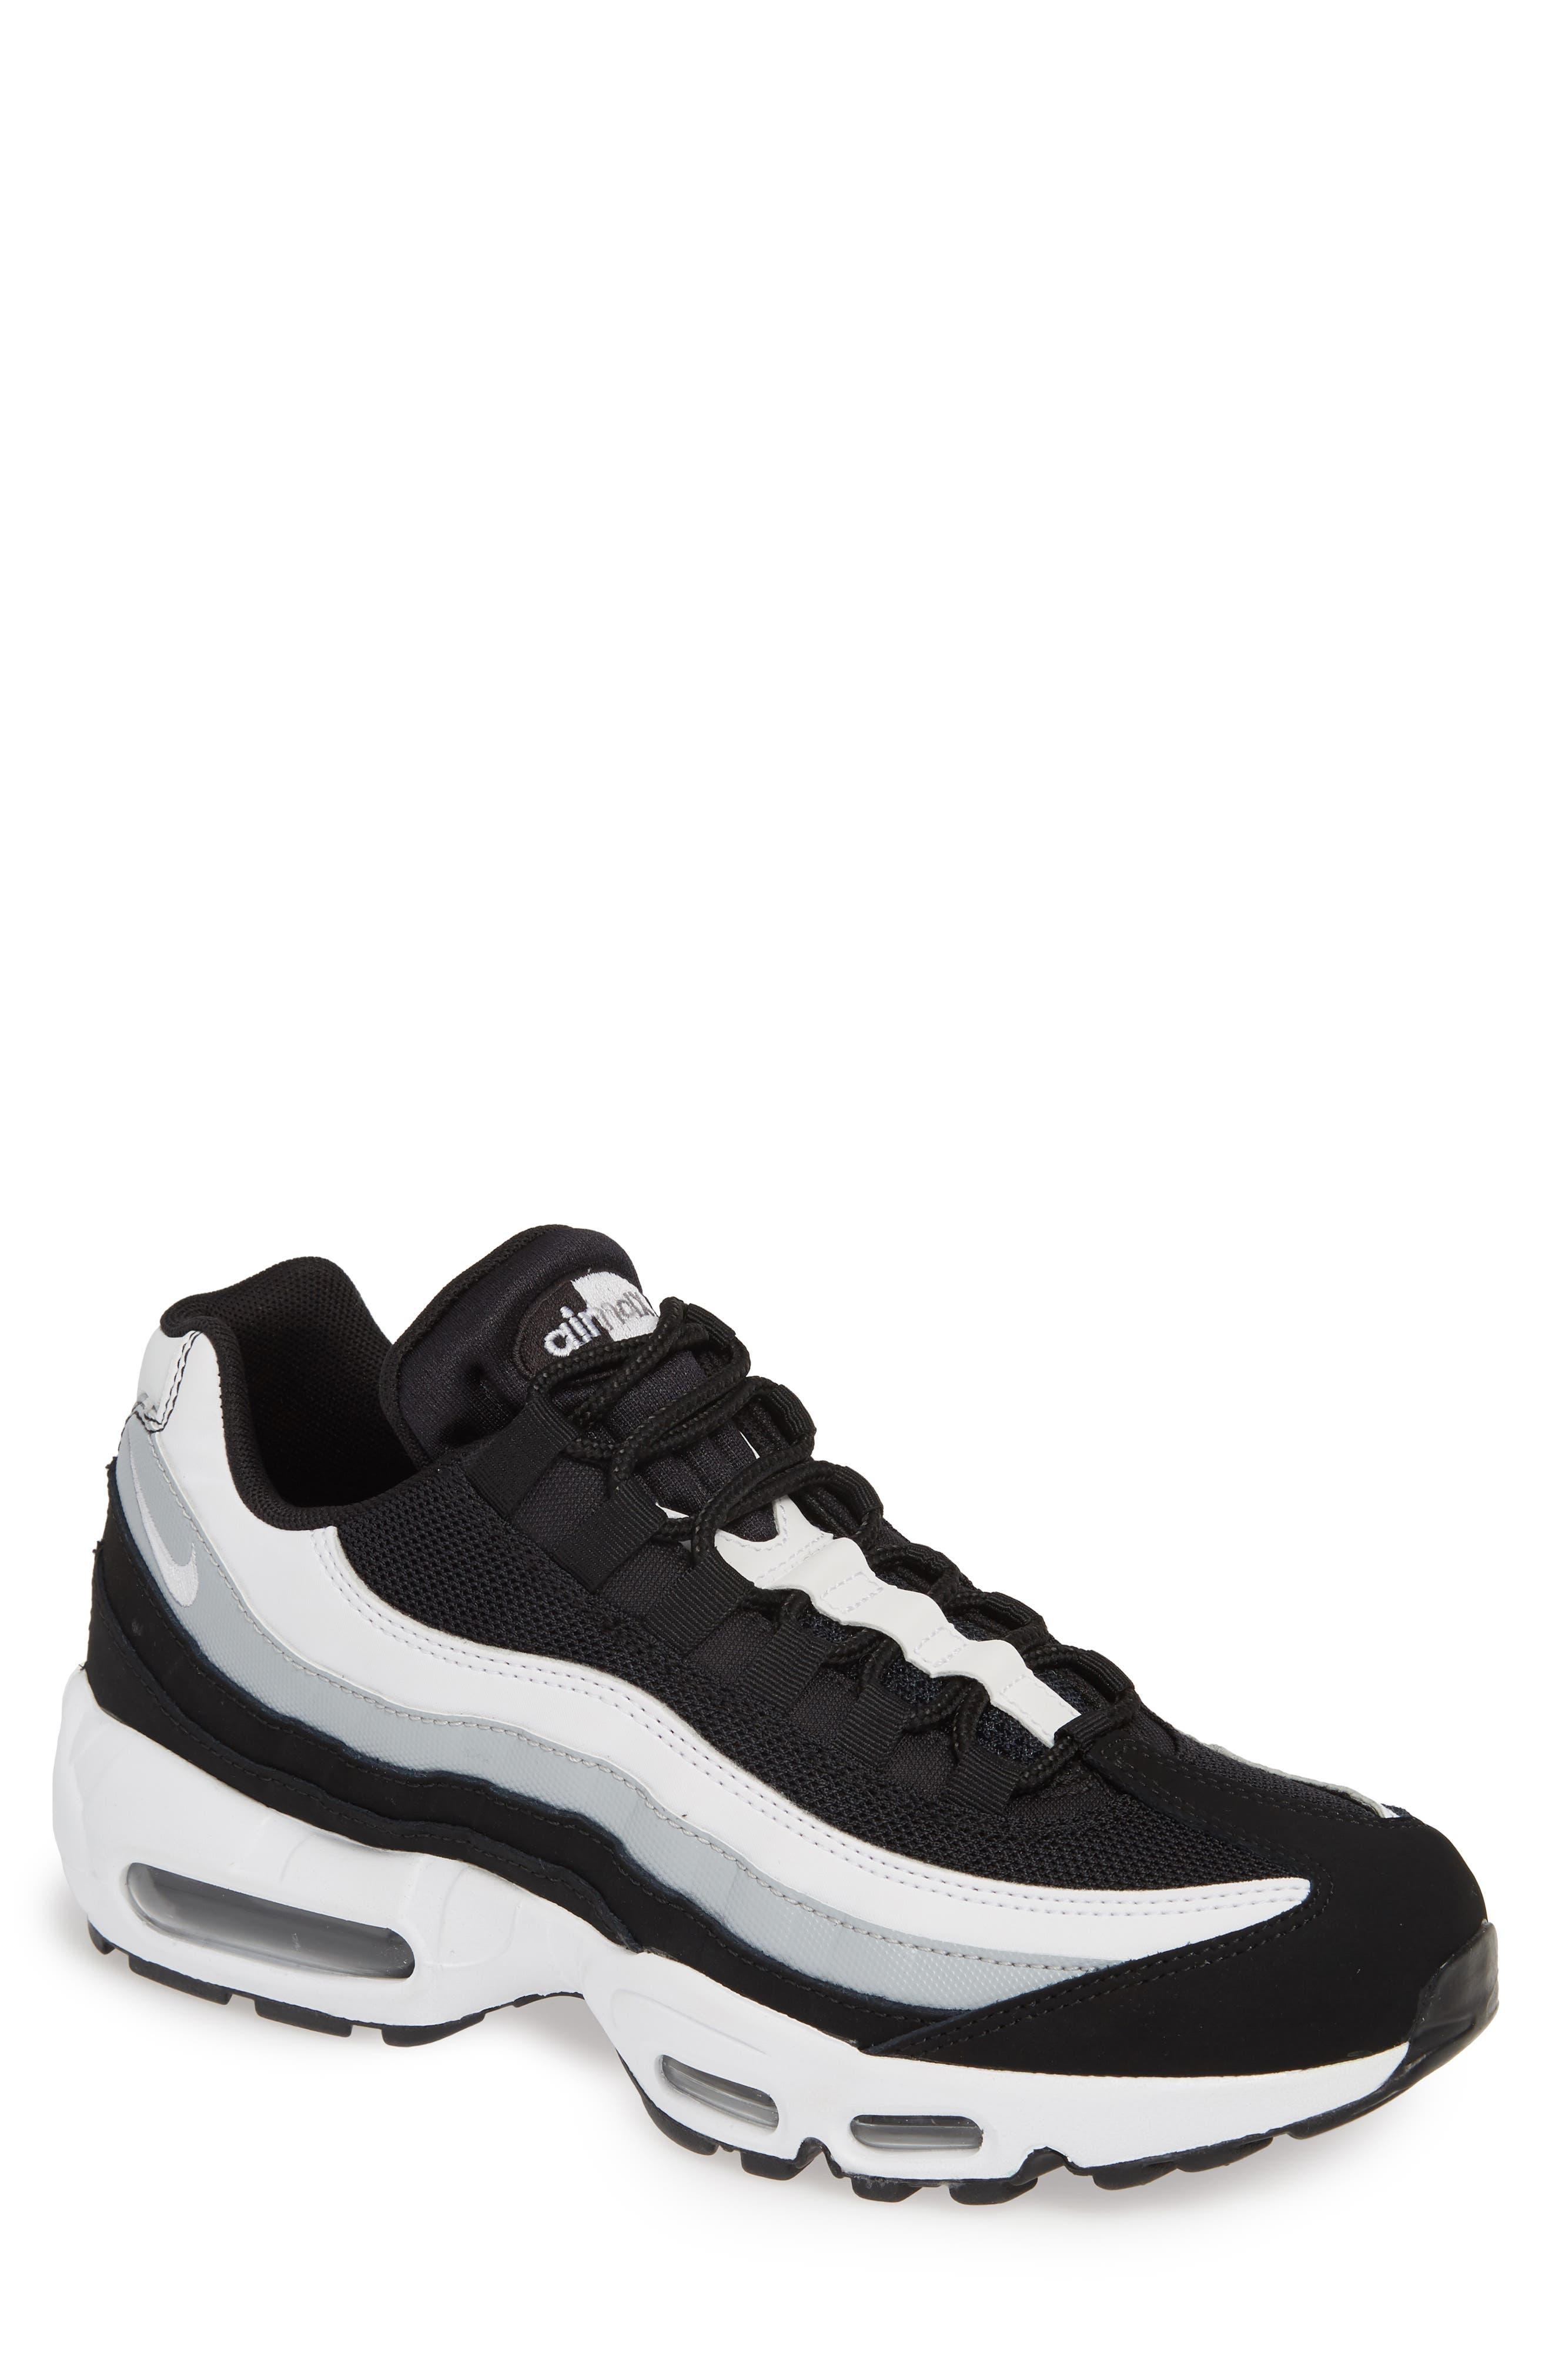 NIKE 'Air Max 95 Essential' Sneaker, Main, color, BLACK/ WHITE/ WOLF GREY